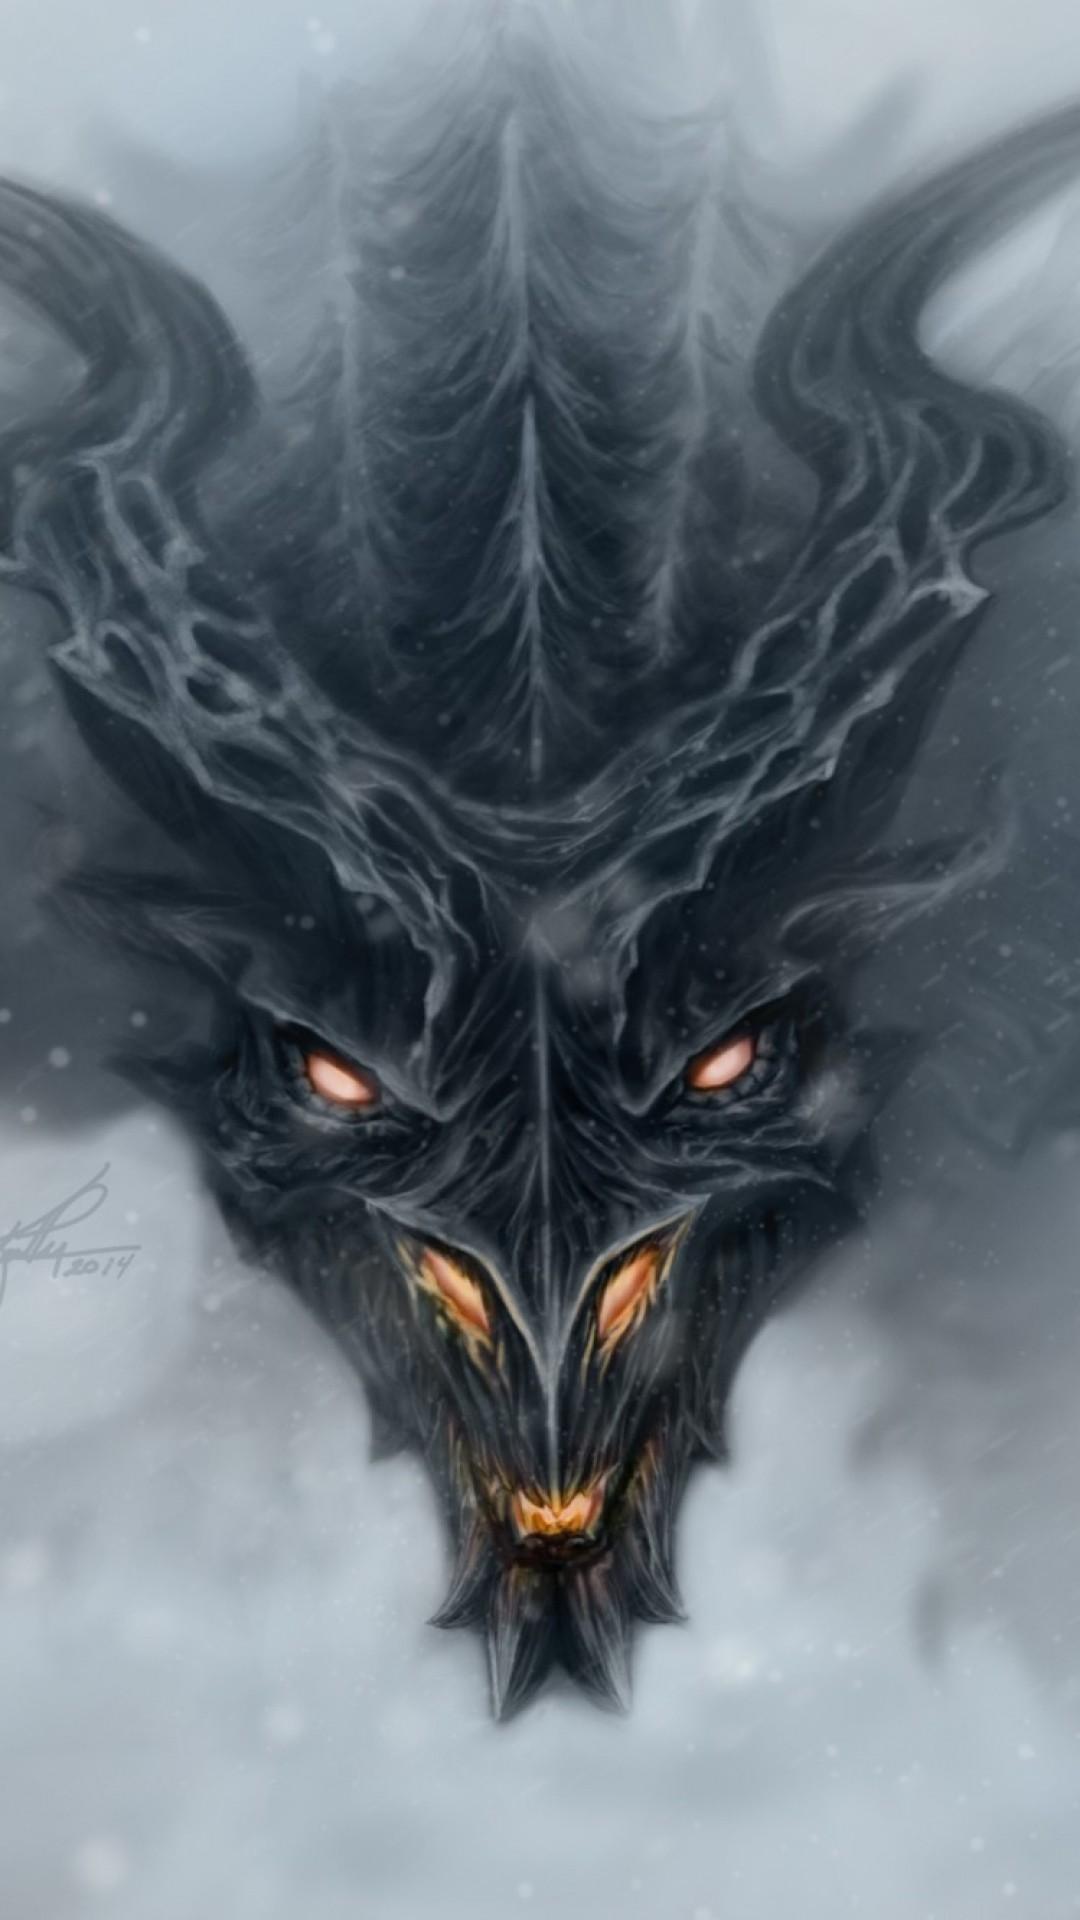 Wallpaper dragon, alduin, skyrim, art